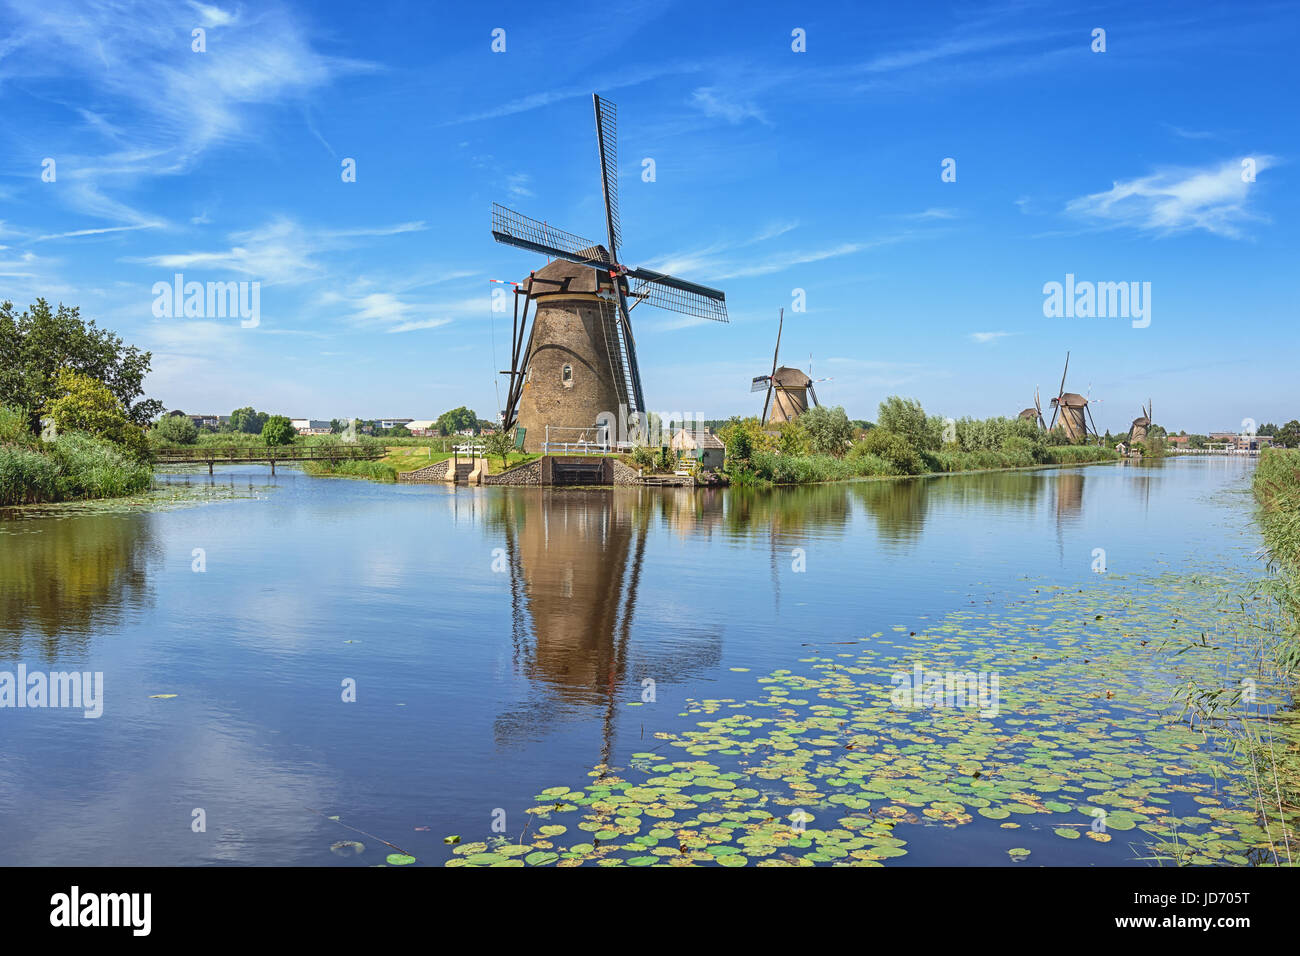 The Kinderdijk mills cover nineteen mills in the northwest of the Alblasserwaard, a polder in the province of Zuid - Stock Image